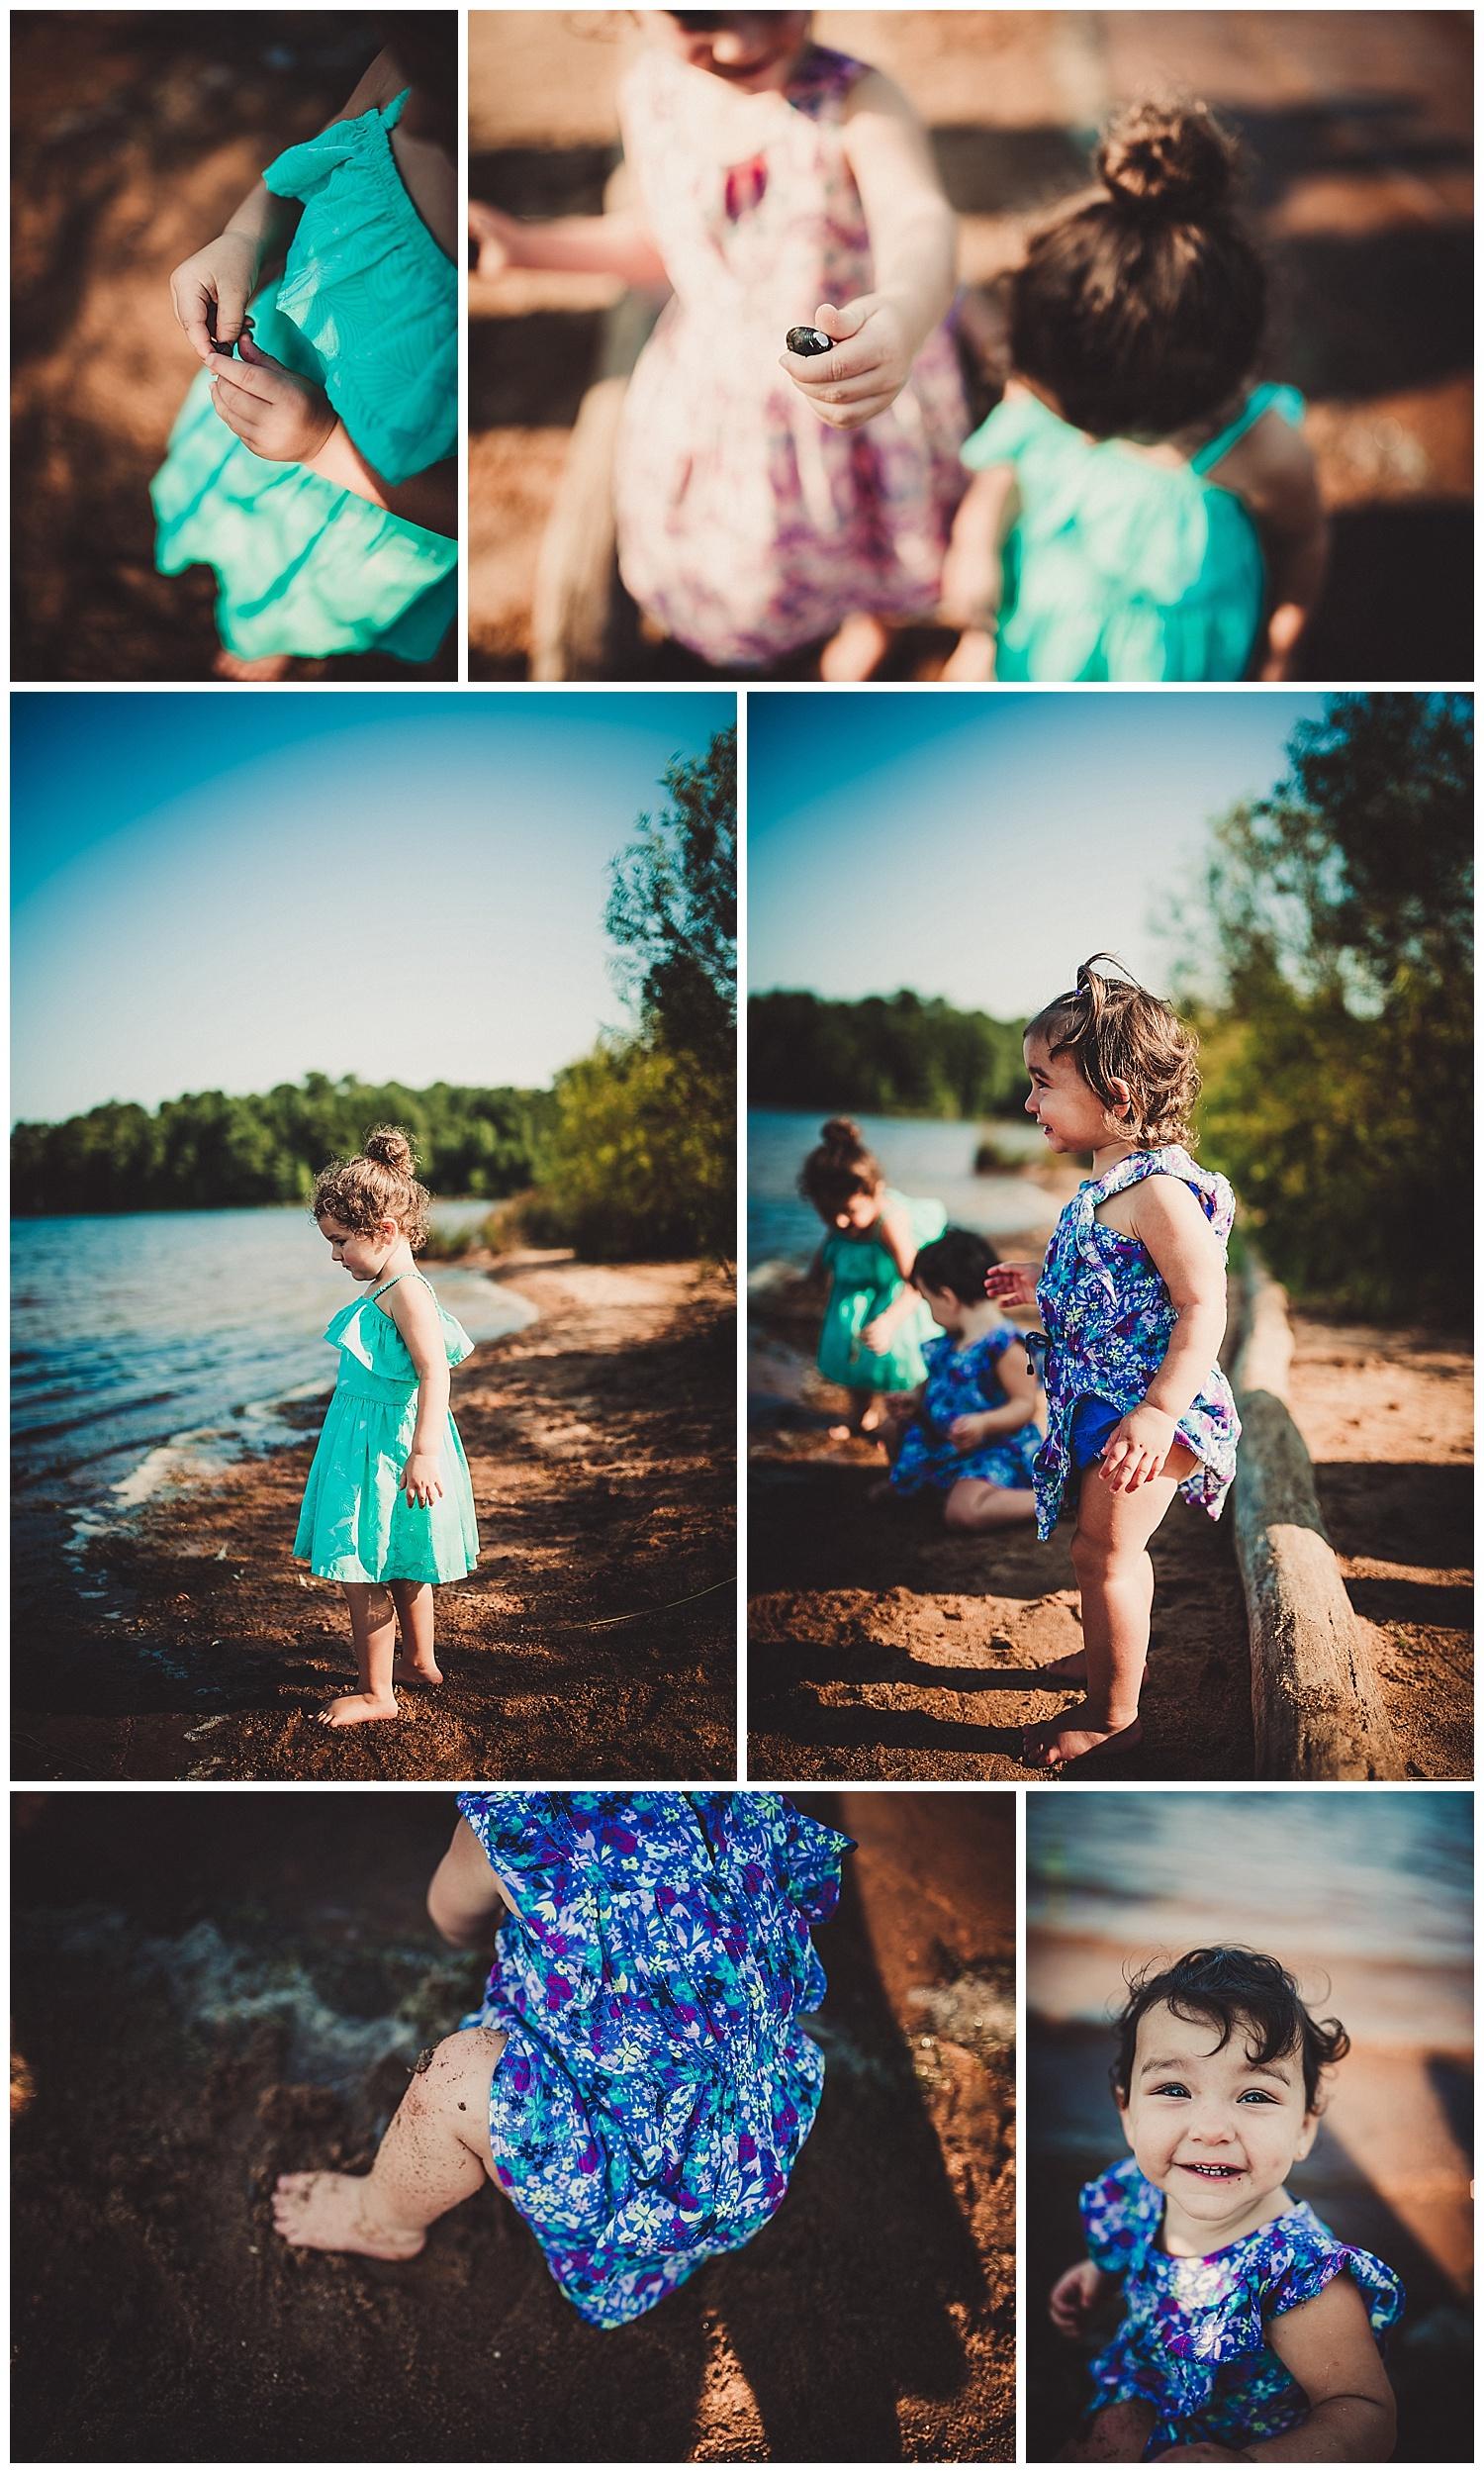 Destination Family Photographer in Atlanta GA from Freeland NEPA